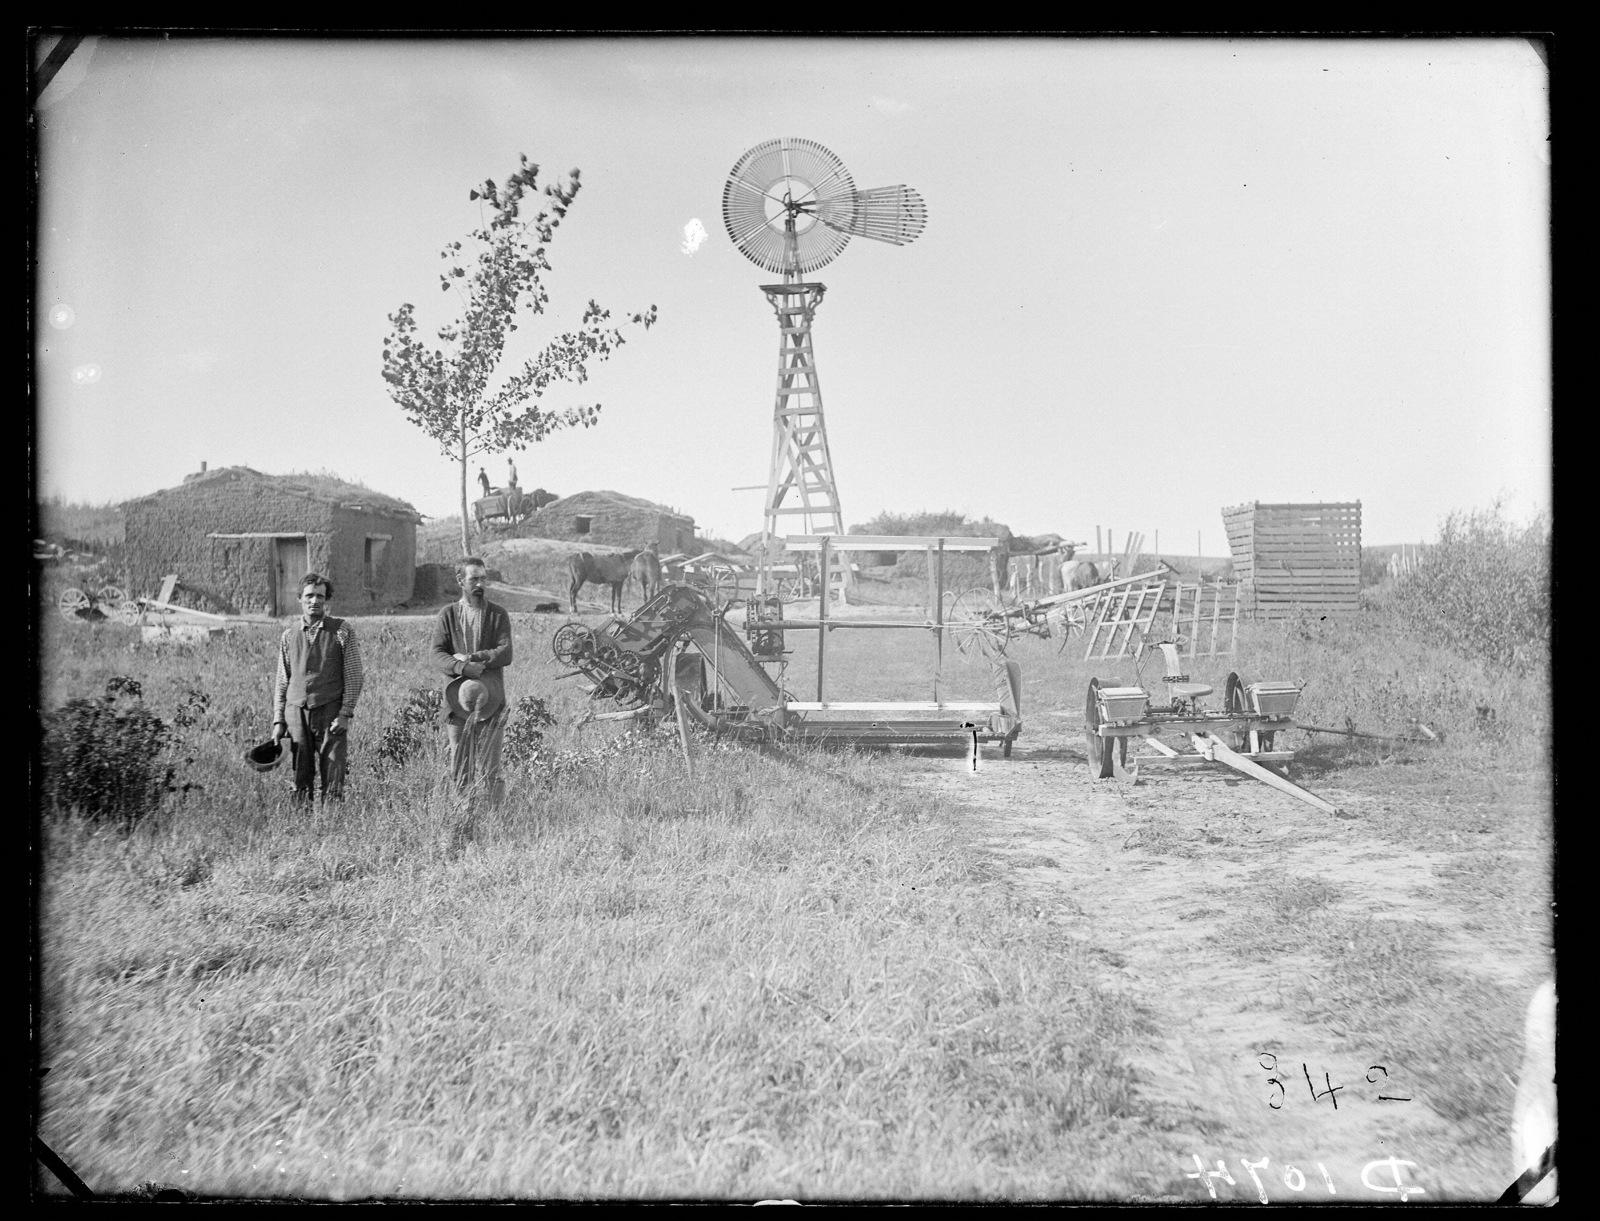 James Stennard (?) sod house, West Union, Custer County, Nebraska.